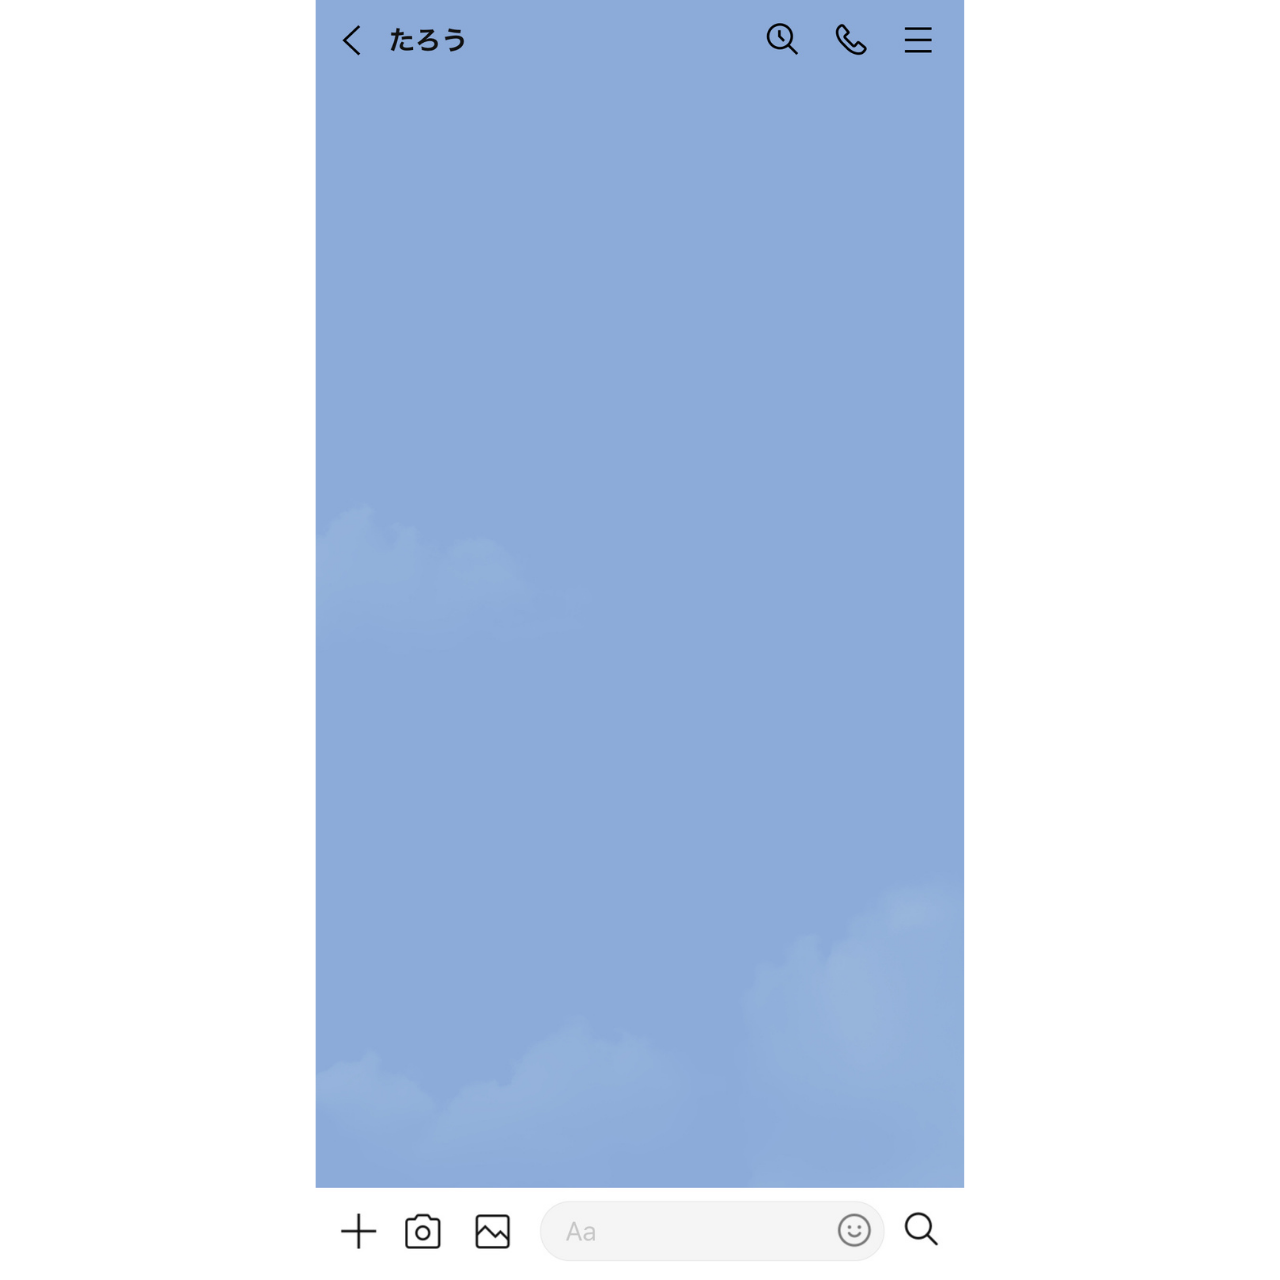 LINEアプリのトーク画面の画像